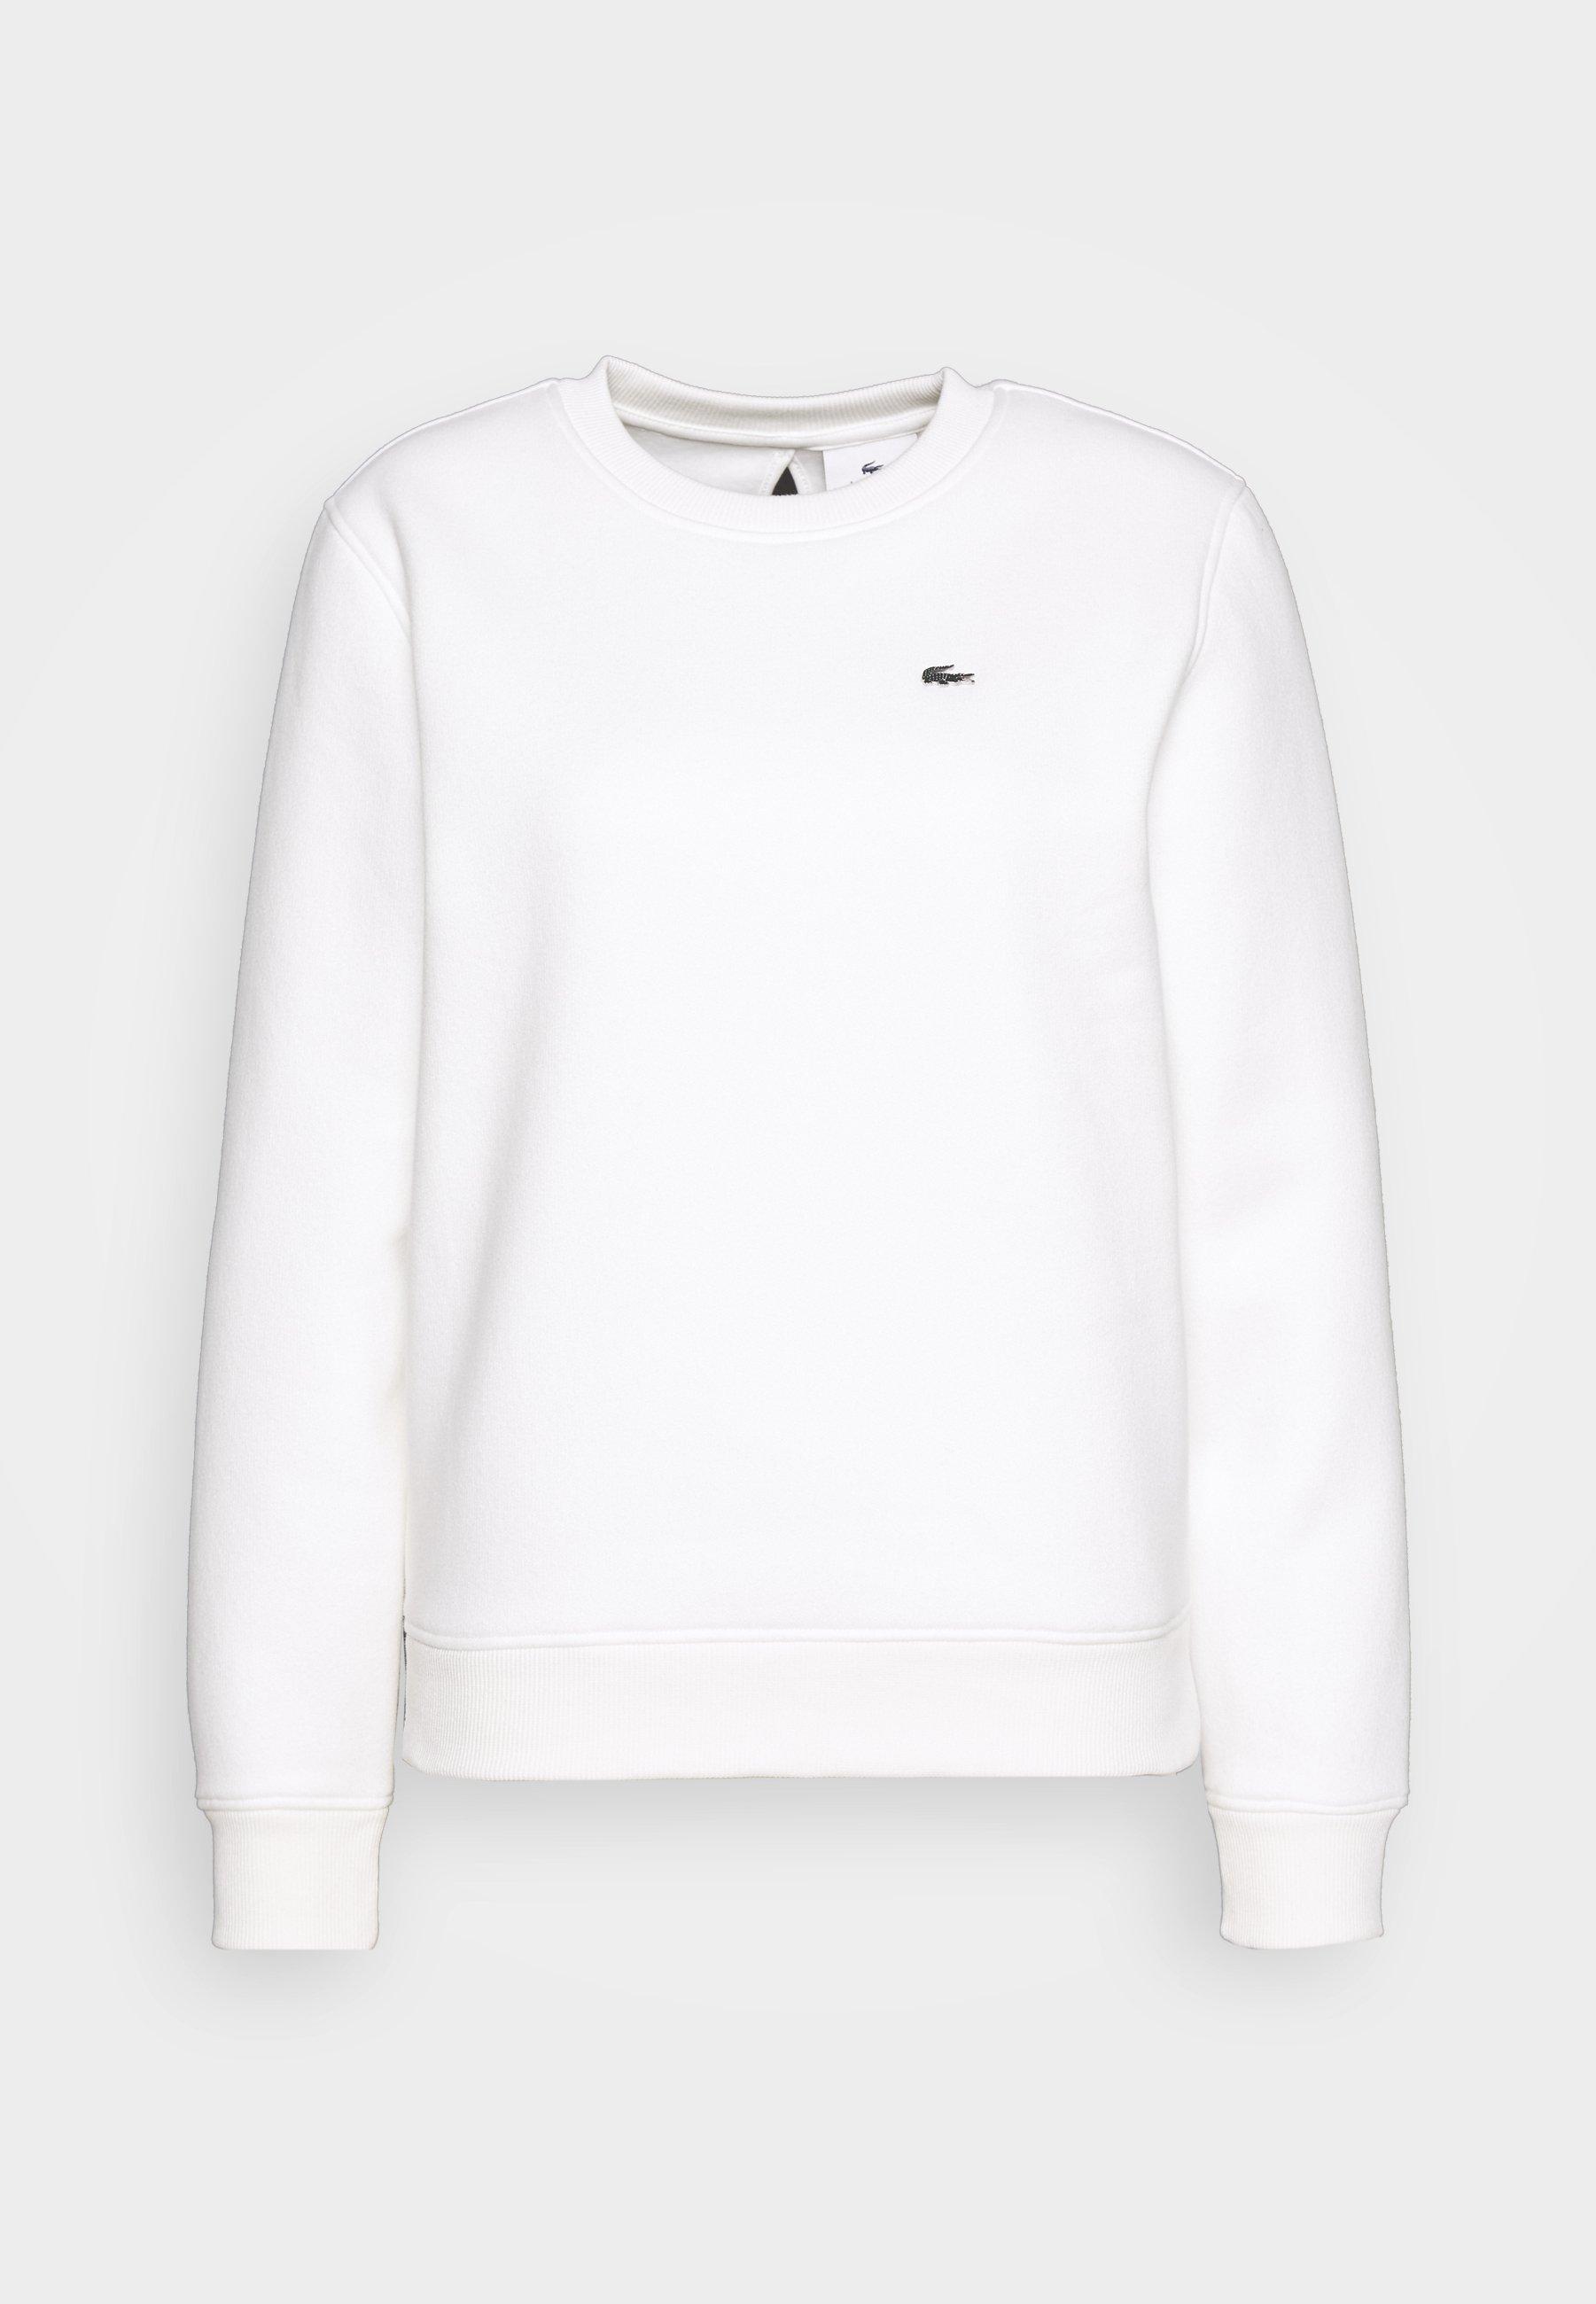 Lacoste LIVE Sweatshirt - flour/écru - ZALANDO.